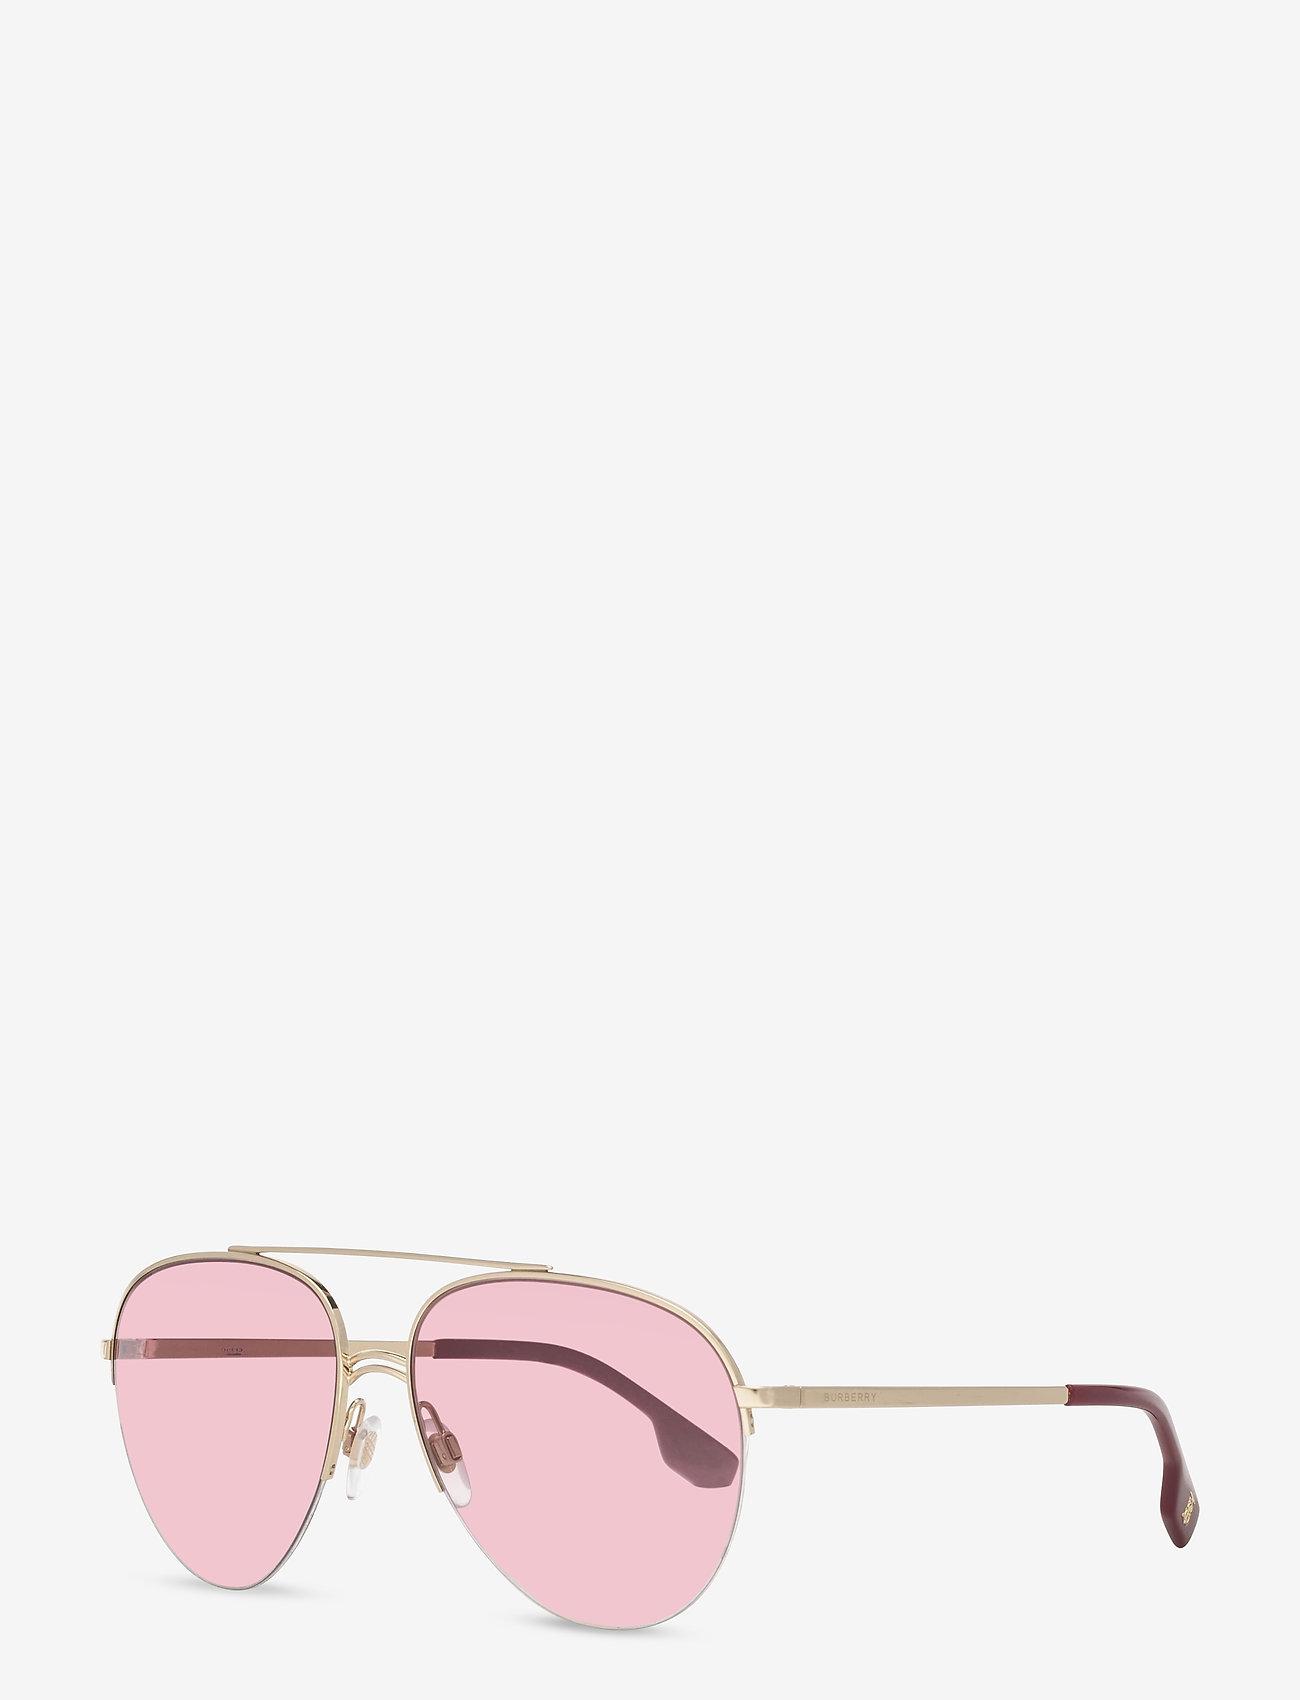 Burberry Sunglasses - Sunglasses - pilot - clear gradient dark violet - 1